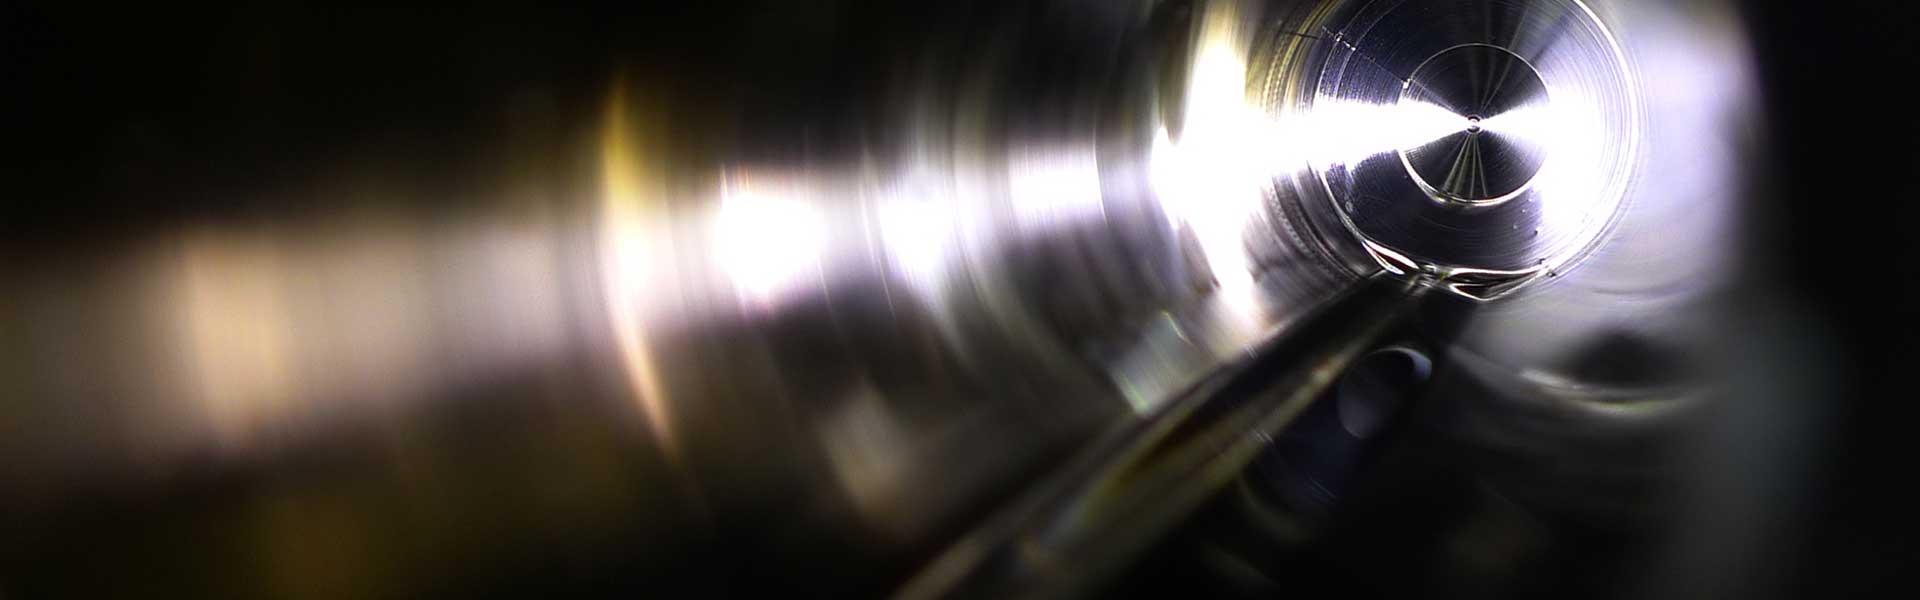 vastuna deep hole drilling machine